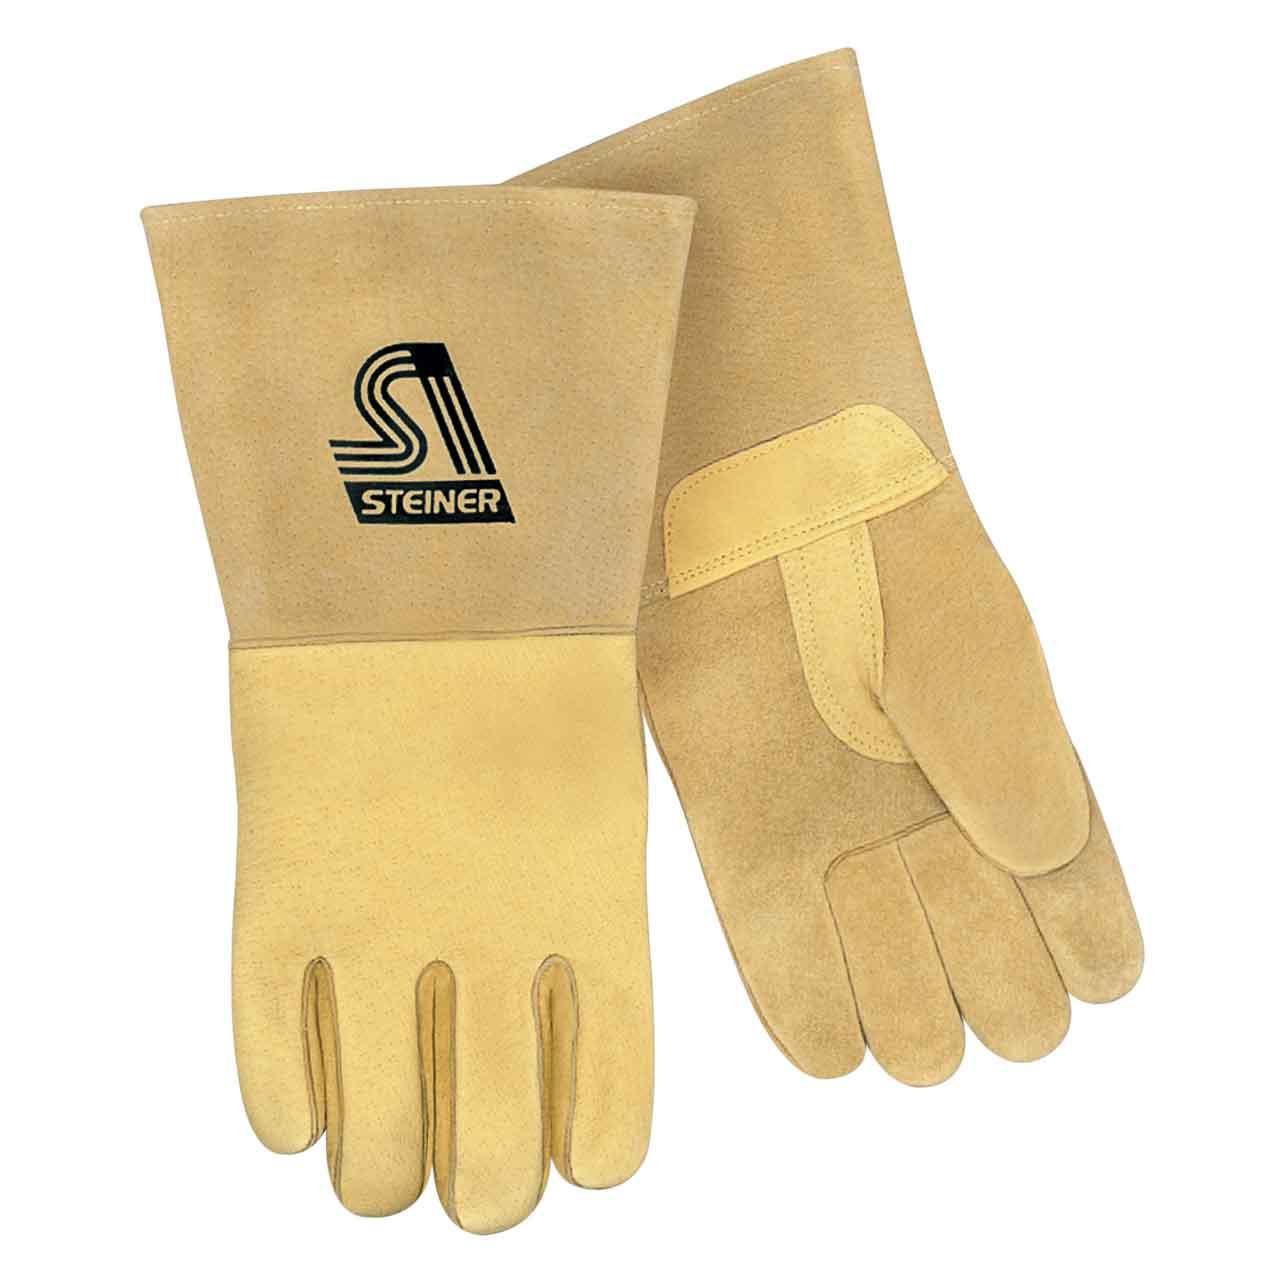 Steiner P750 Pigskin MIG Stick Welding Gloves, Unlined Palm, Thermocore Foam Back, Long Cuff, Medium